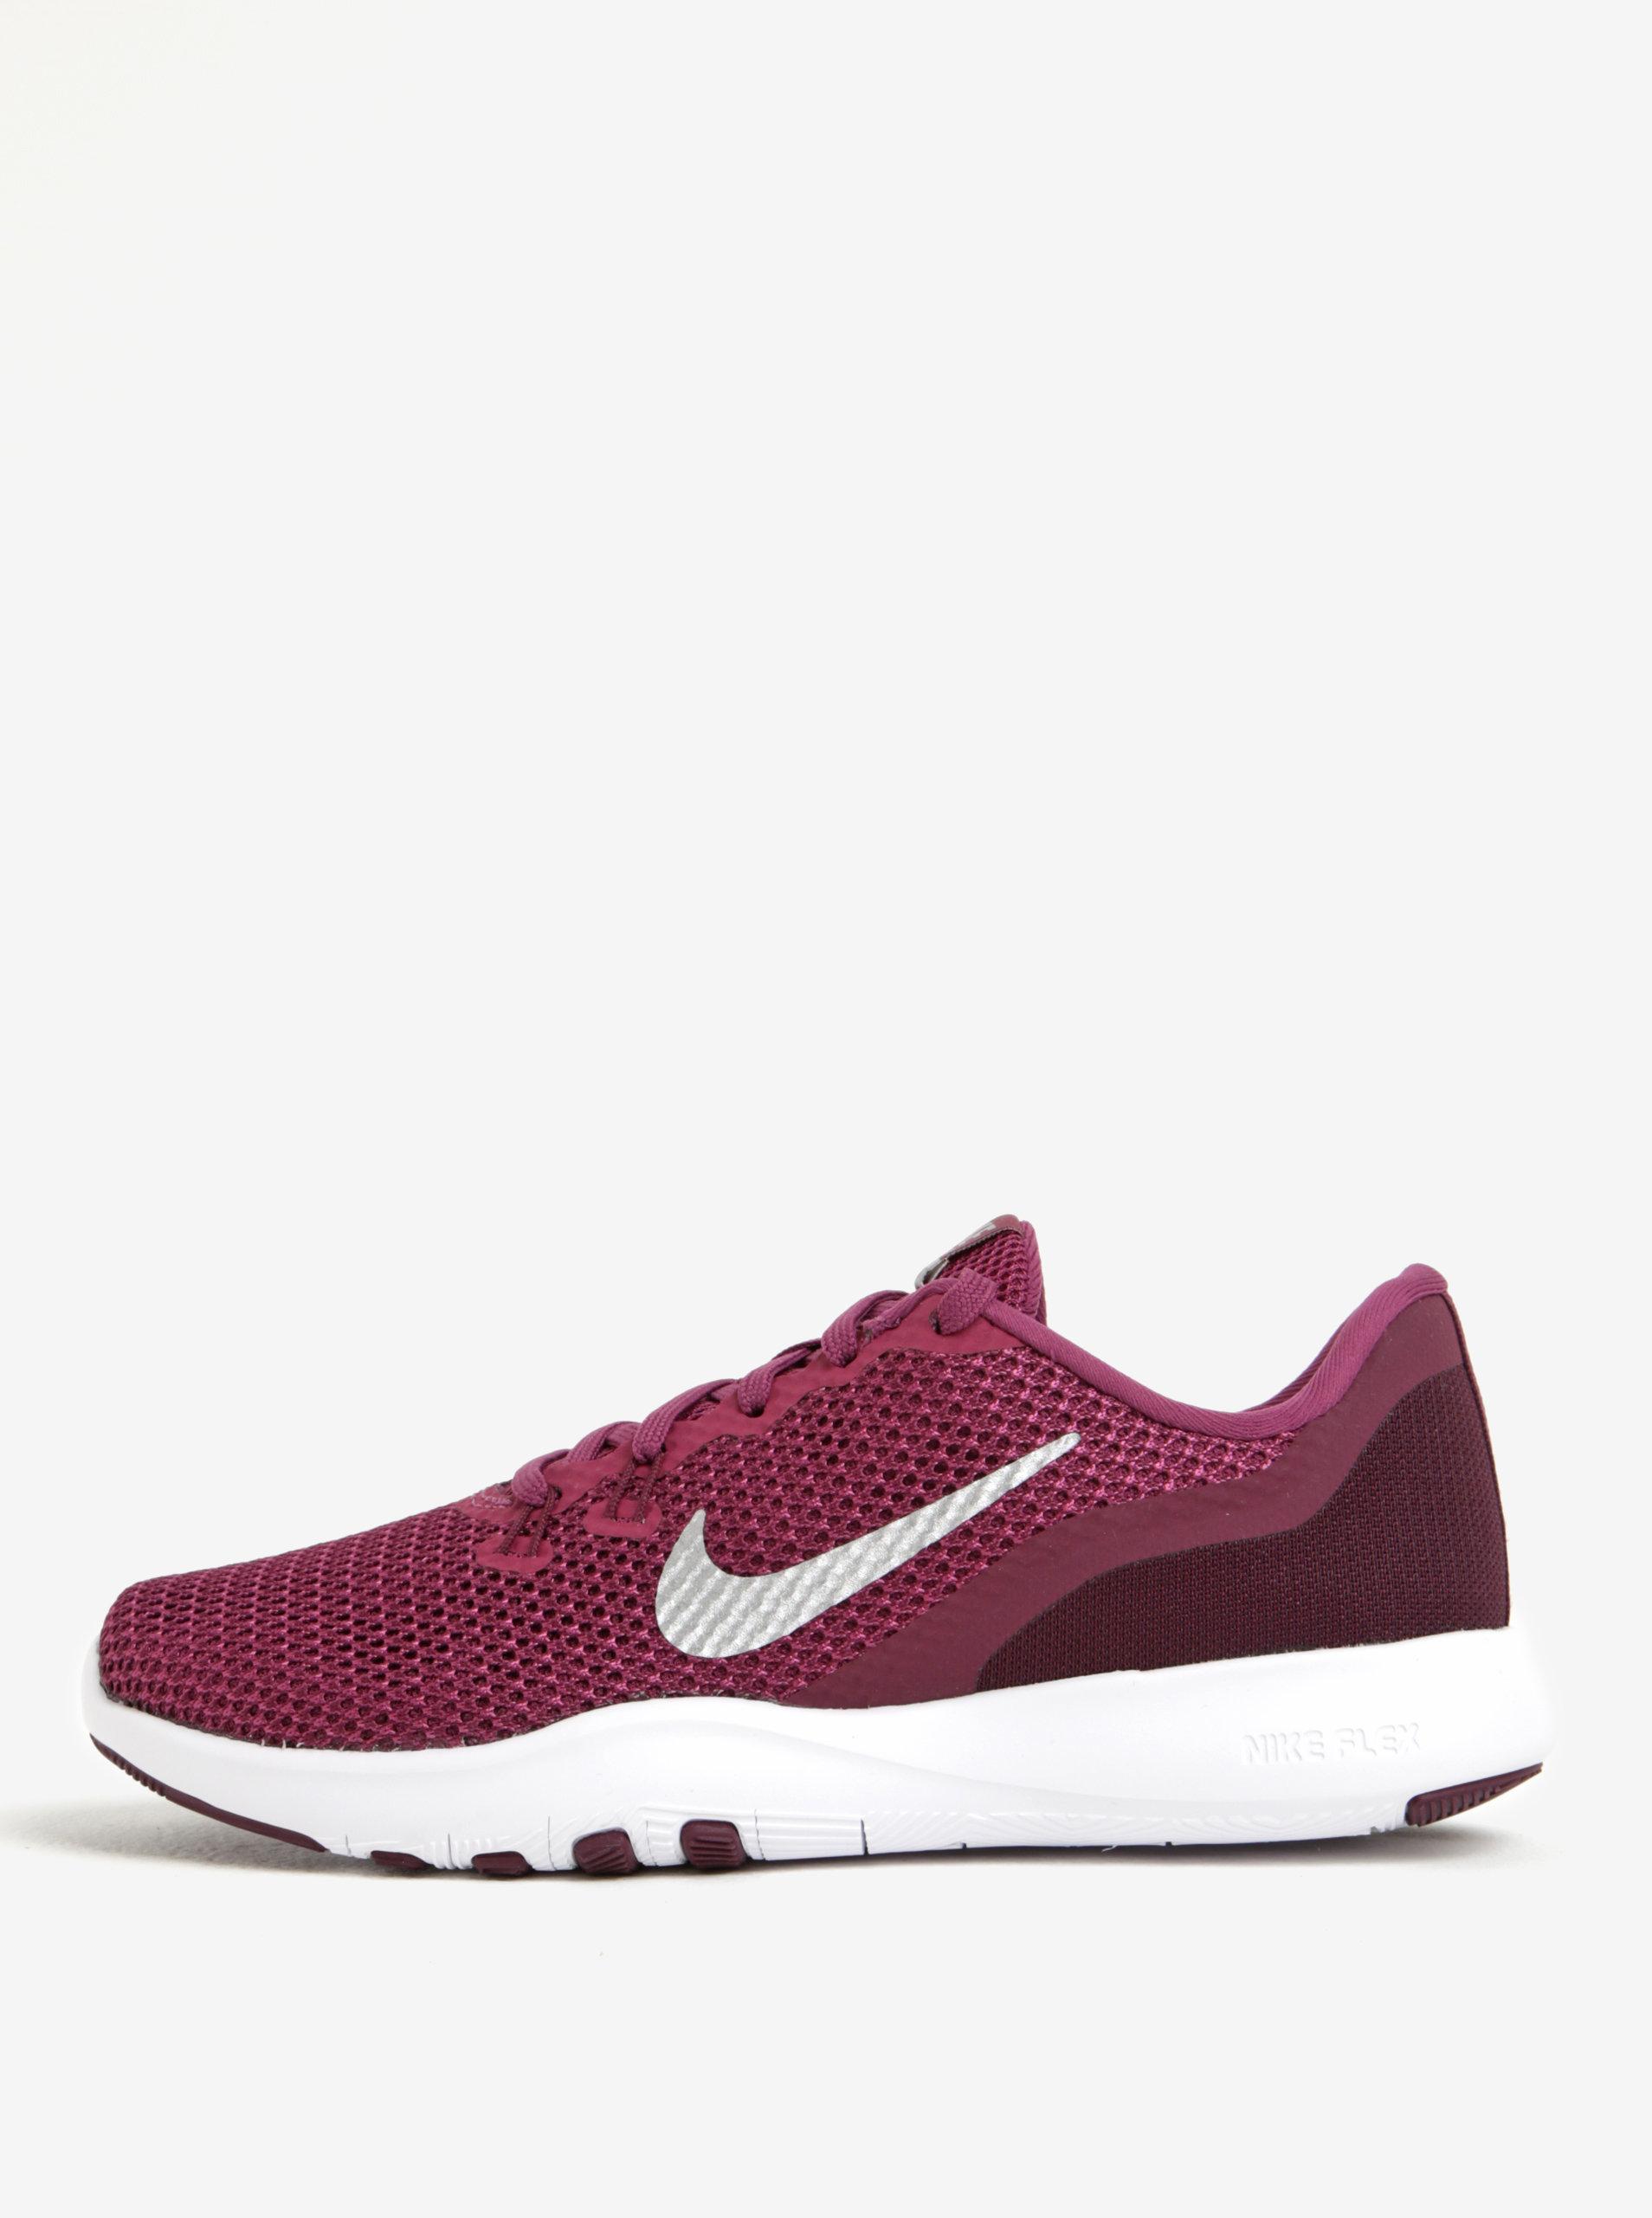 4c72b999e4 Fialové dámske tenisky Nike Flex TR 7 ...